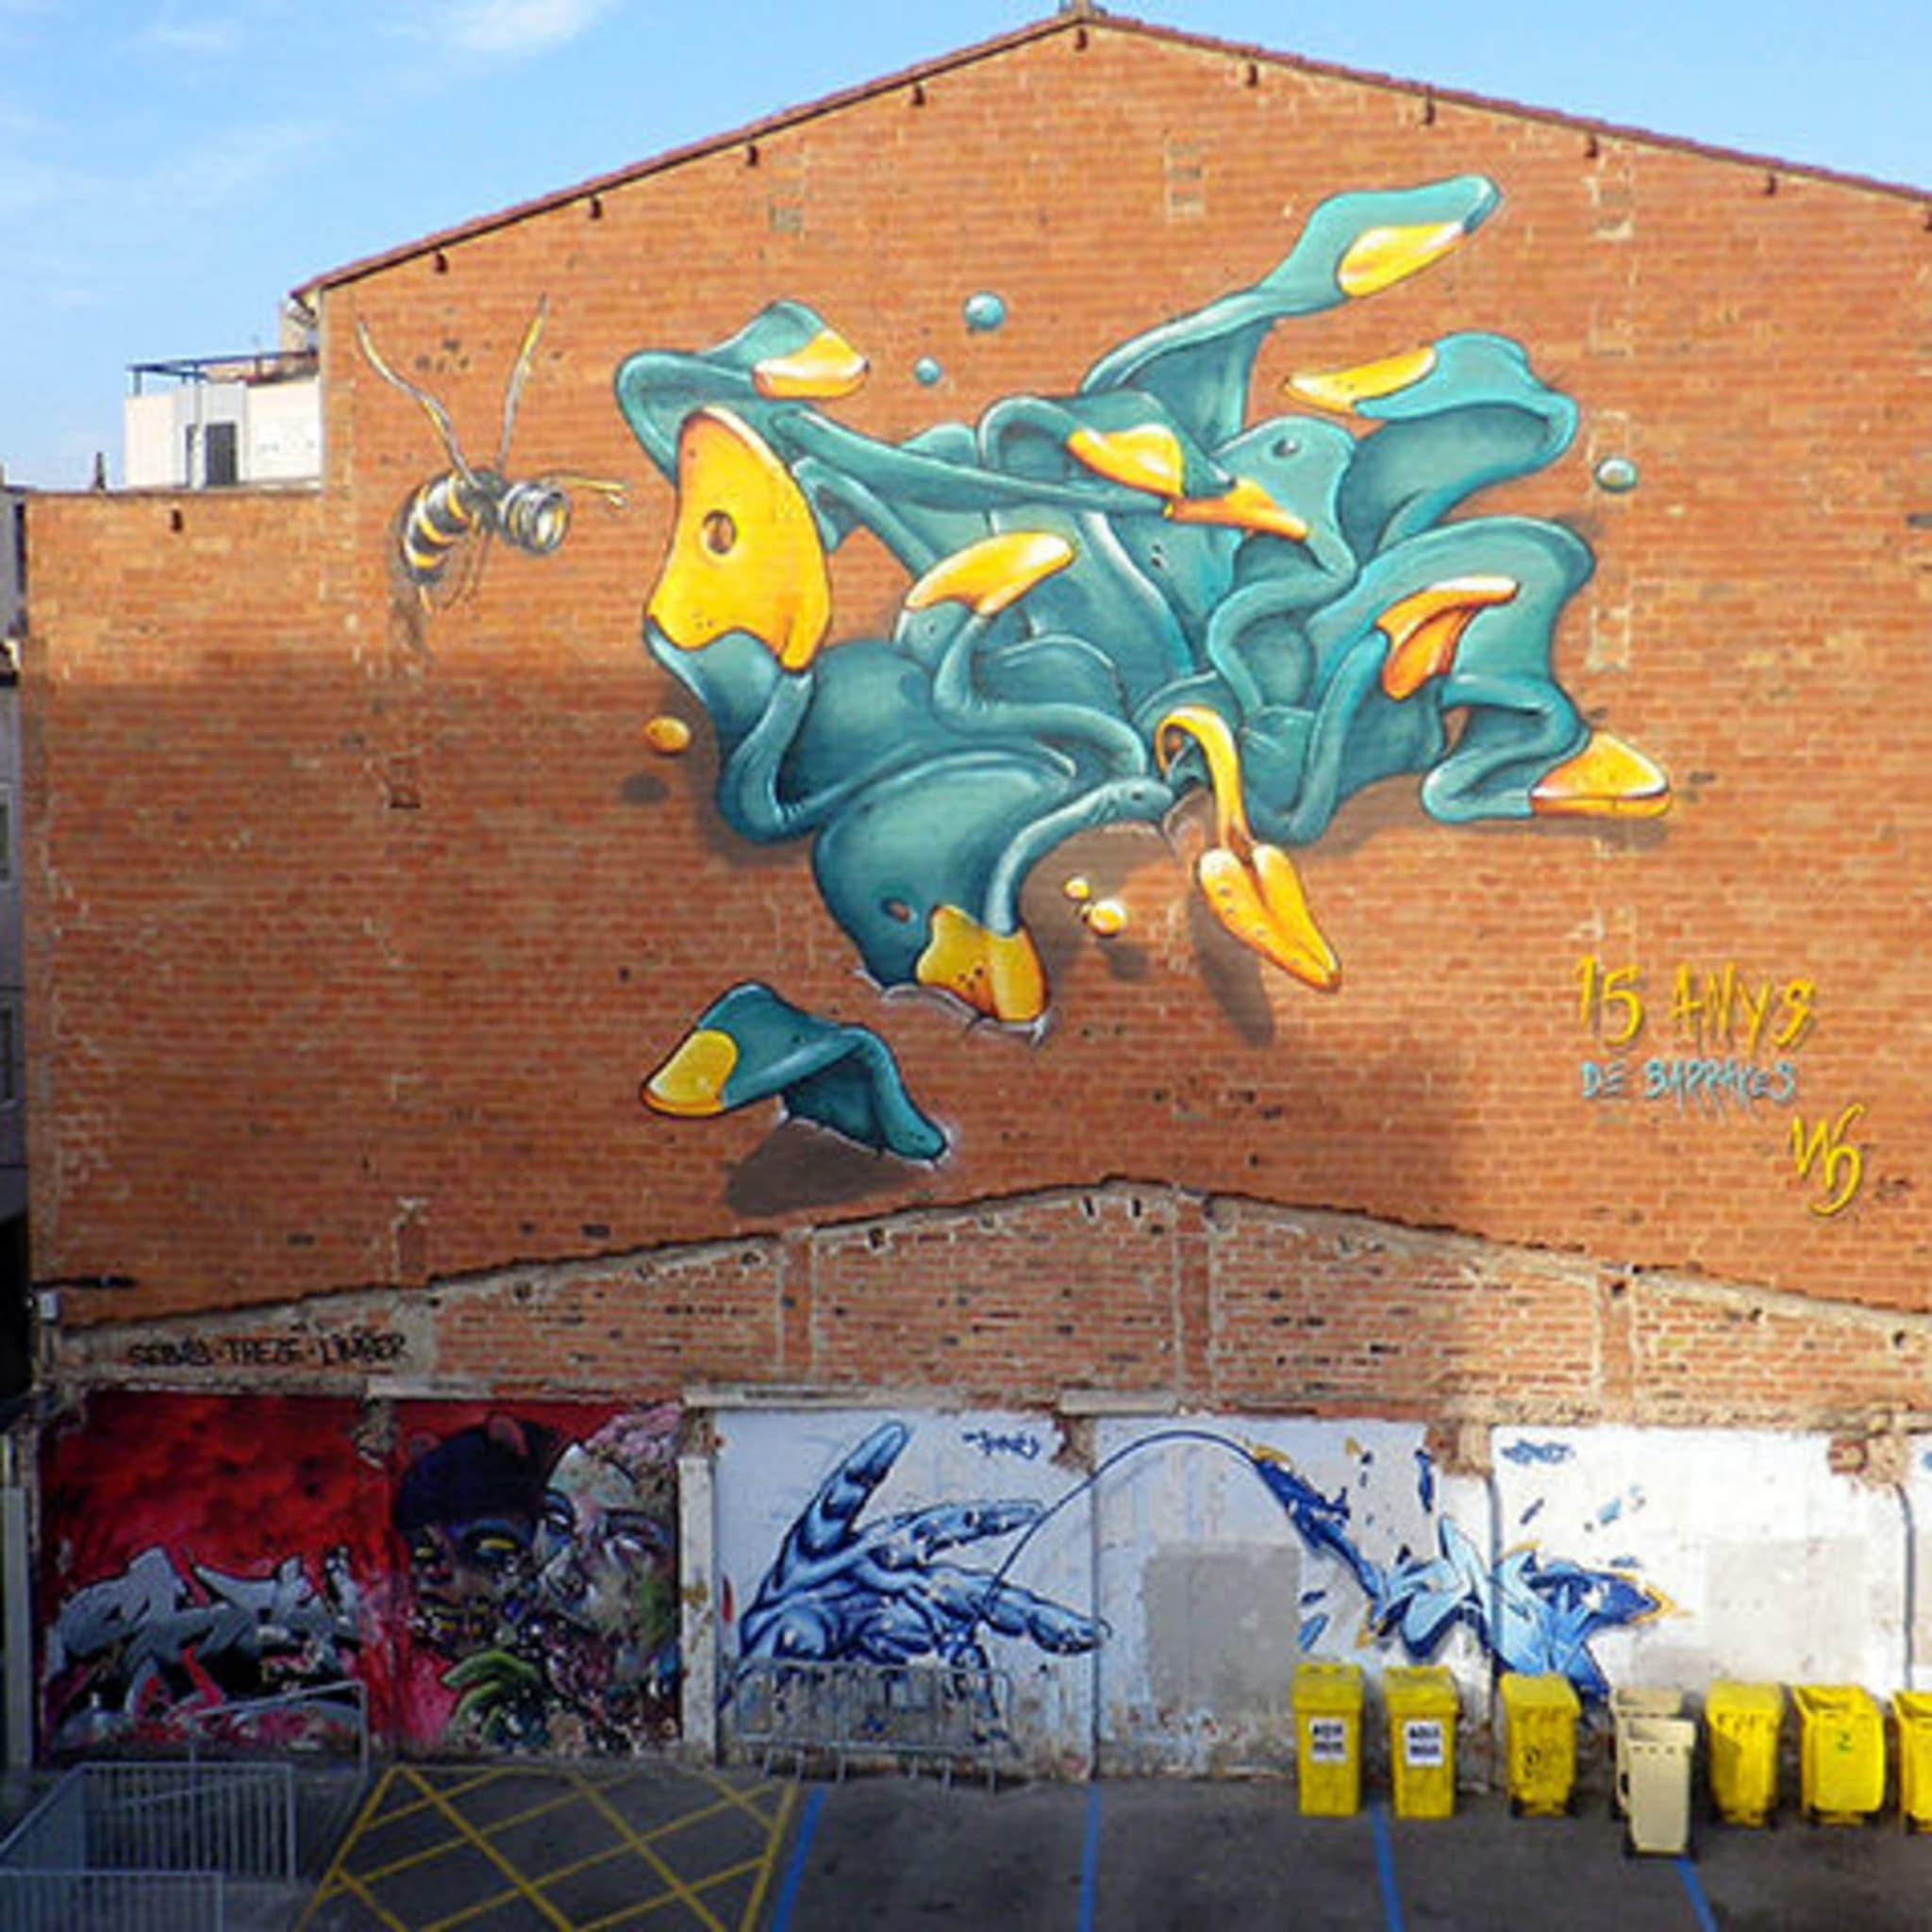 Œuvre Par Werens à Sabadell